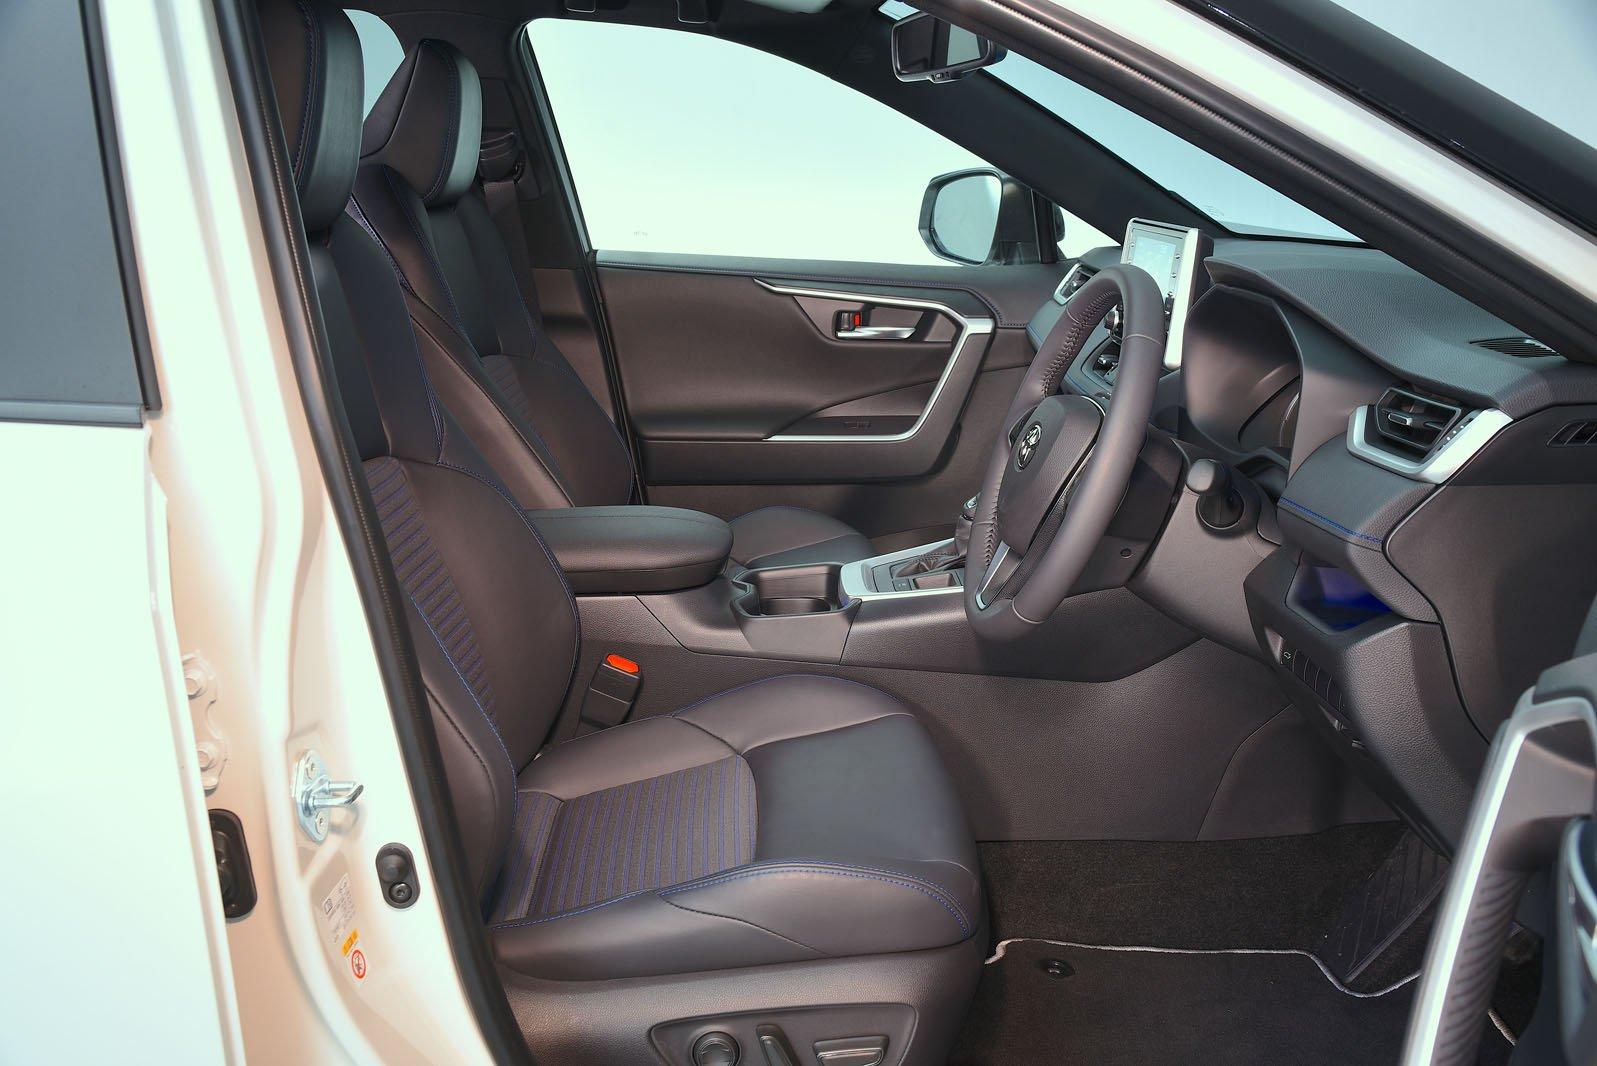 Toyota RAV4 2021 RHD front interior shot